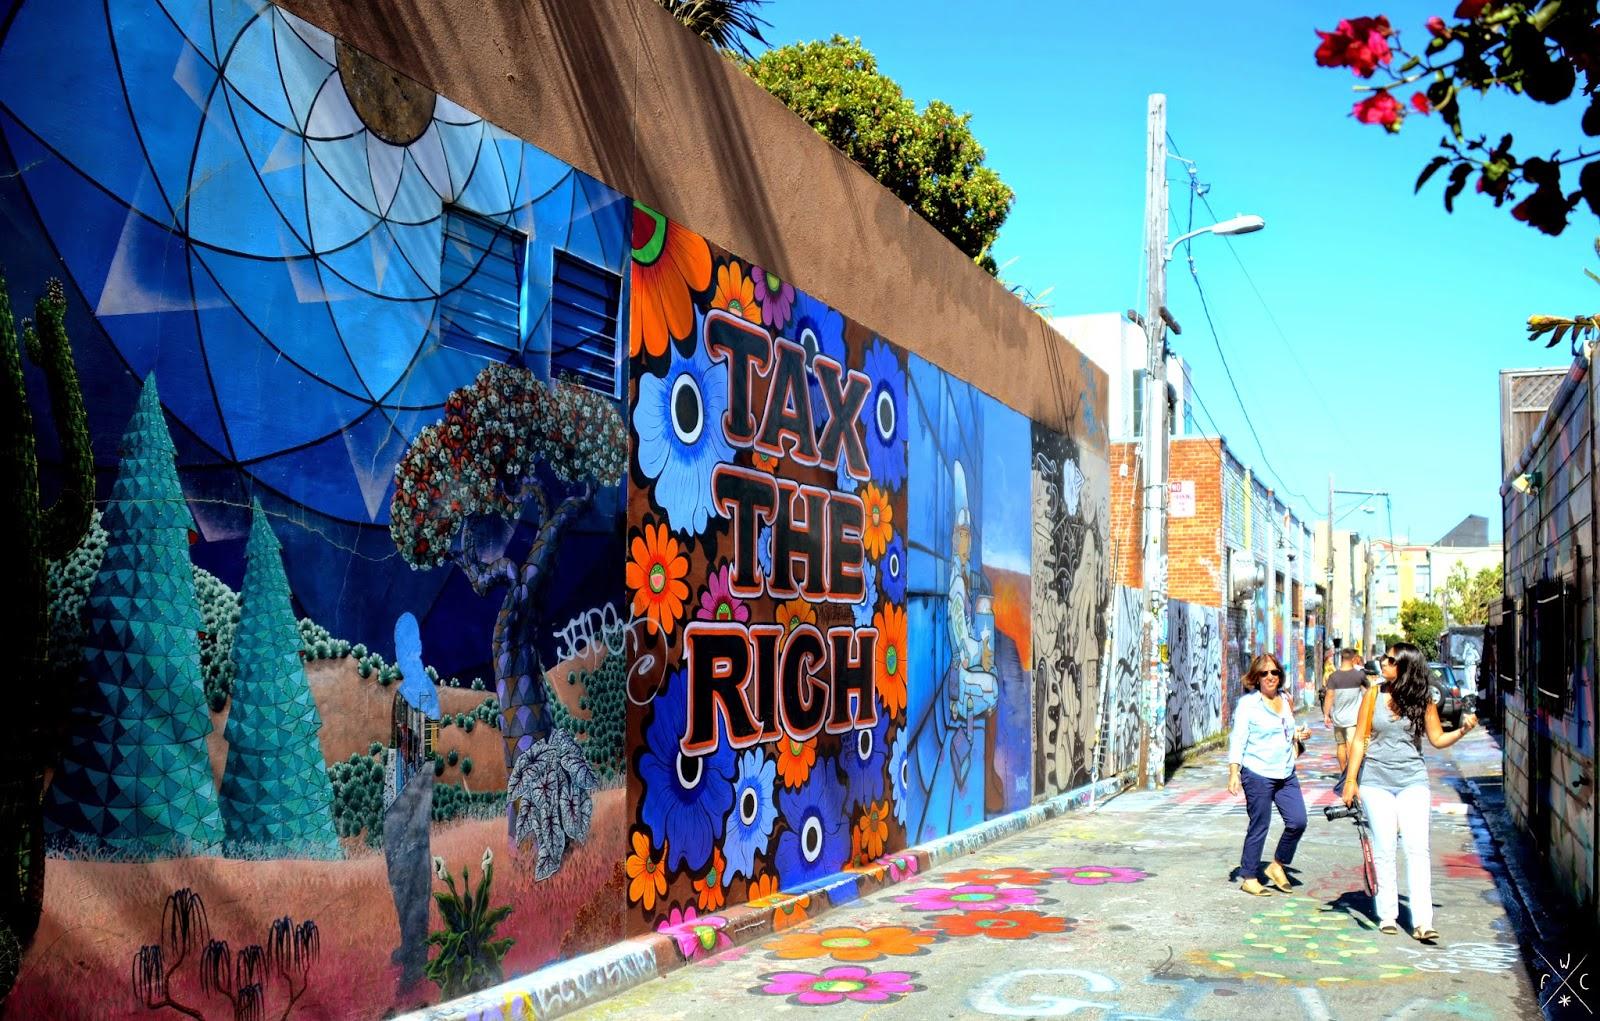 Tax The Rich, by Megan Wilson